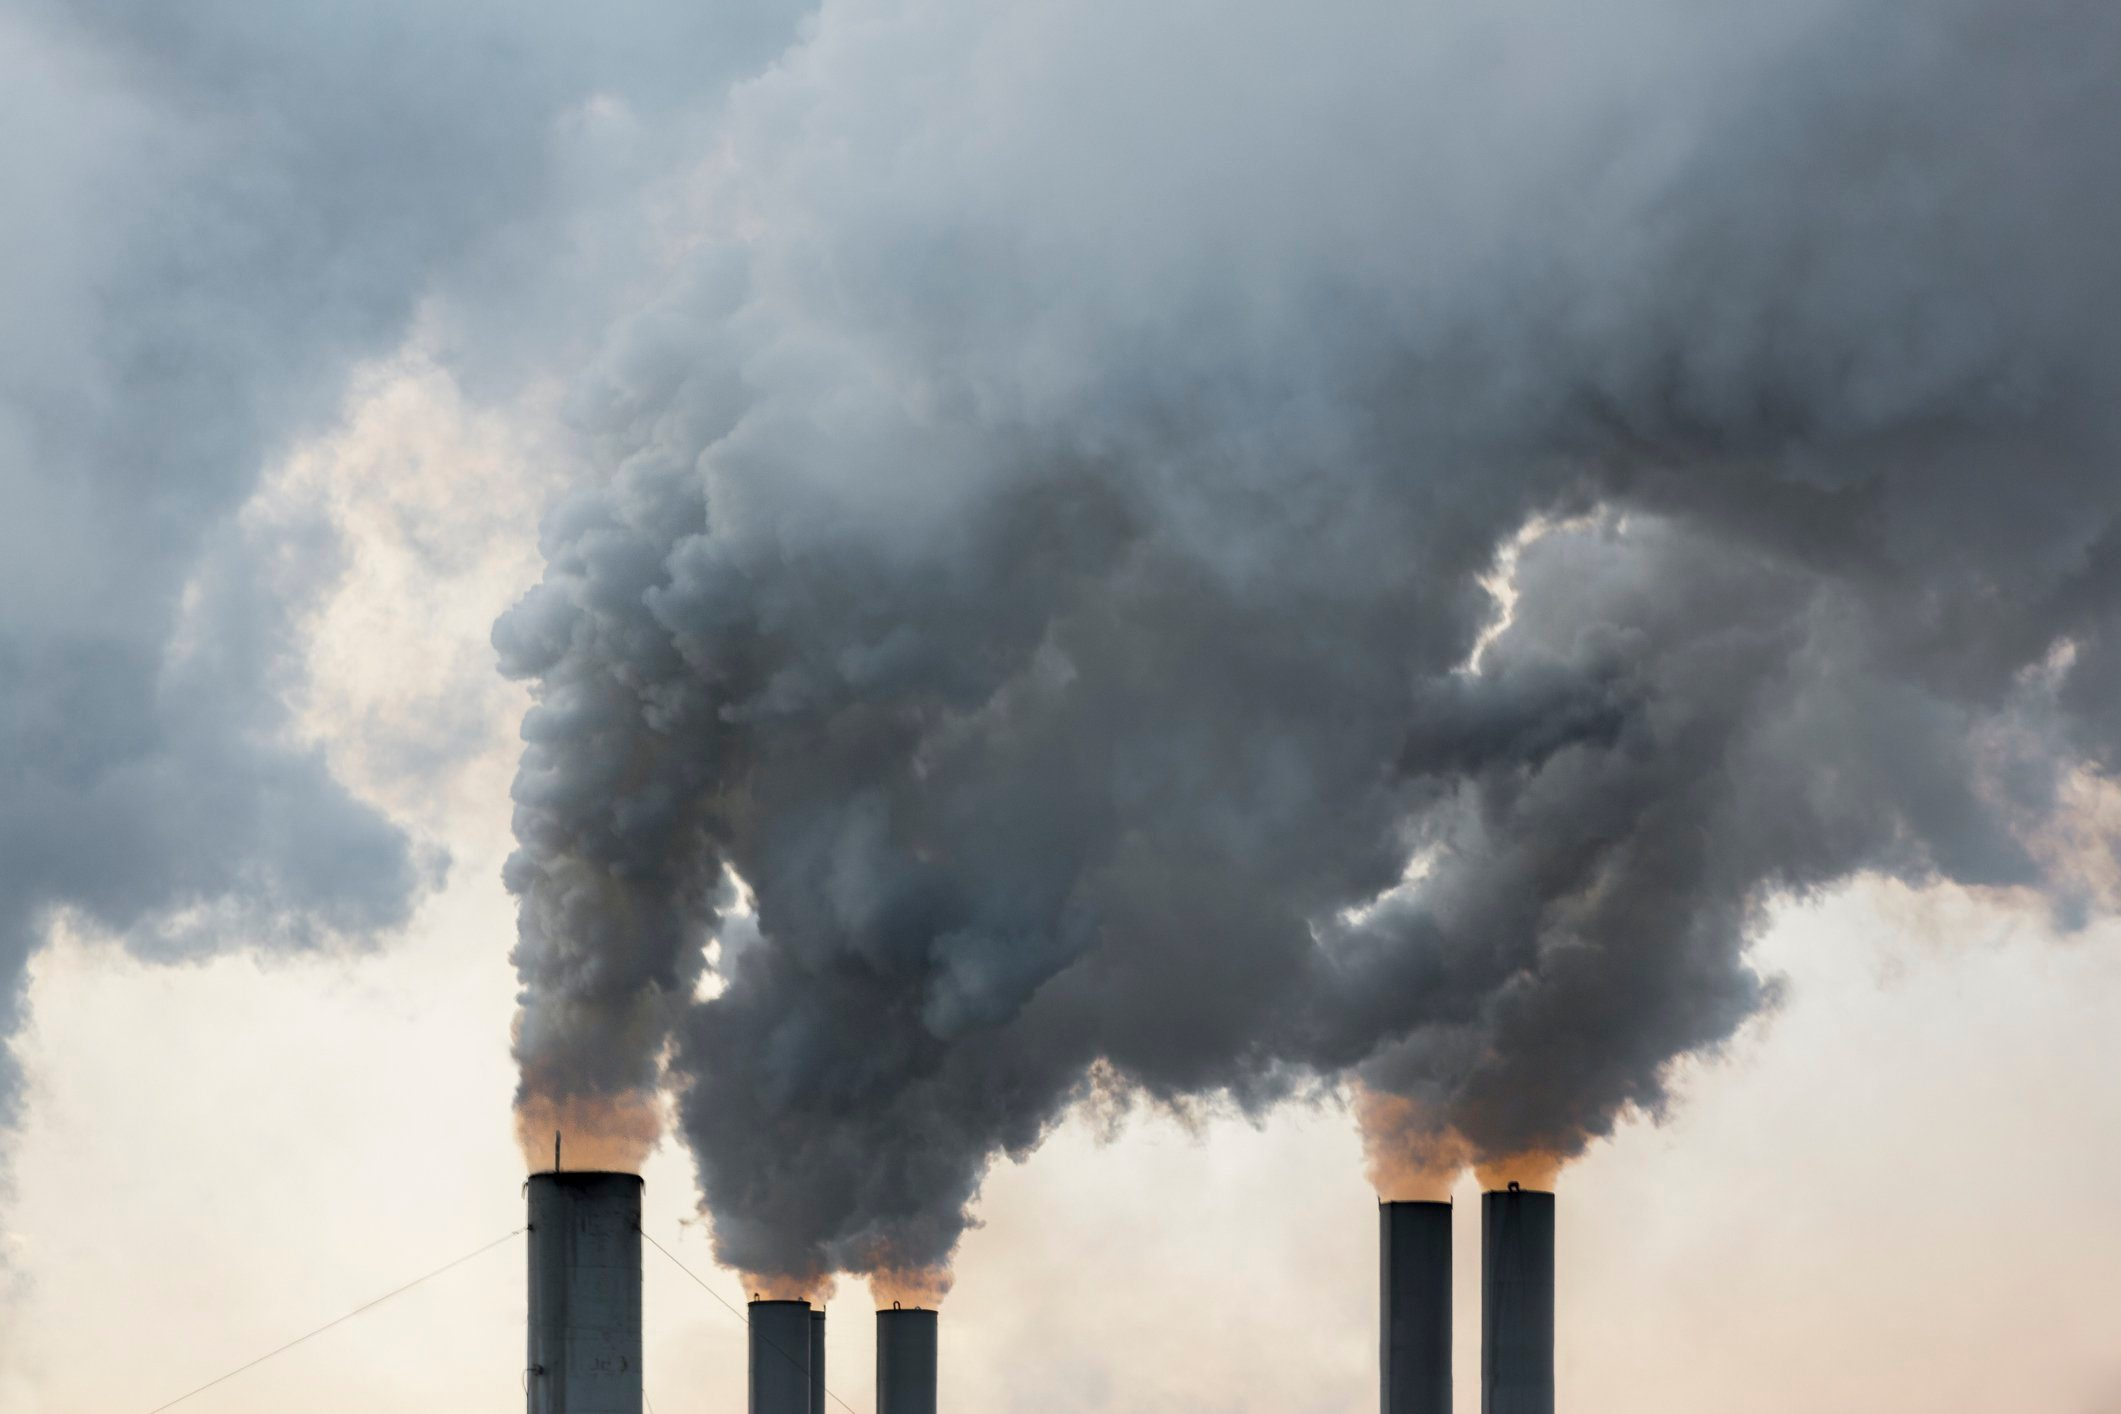 2020   Smoke emerging from chimneys